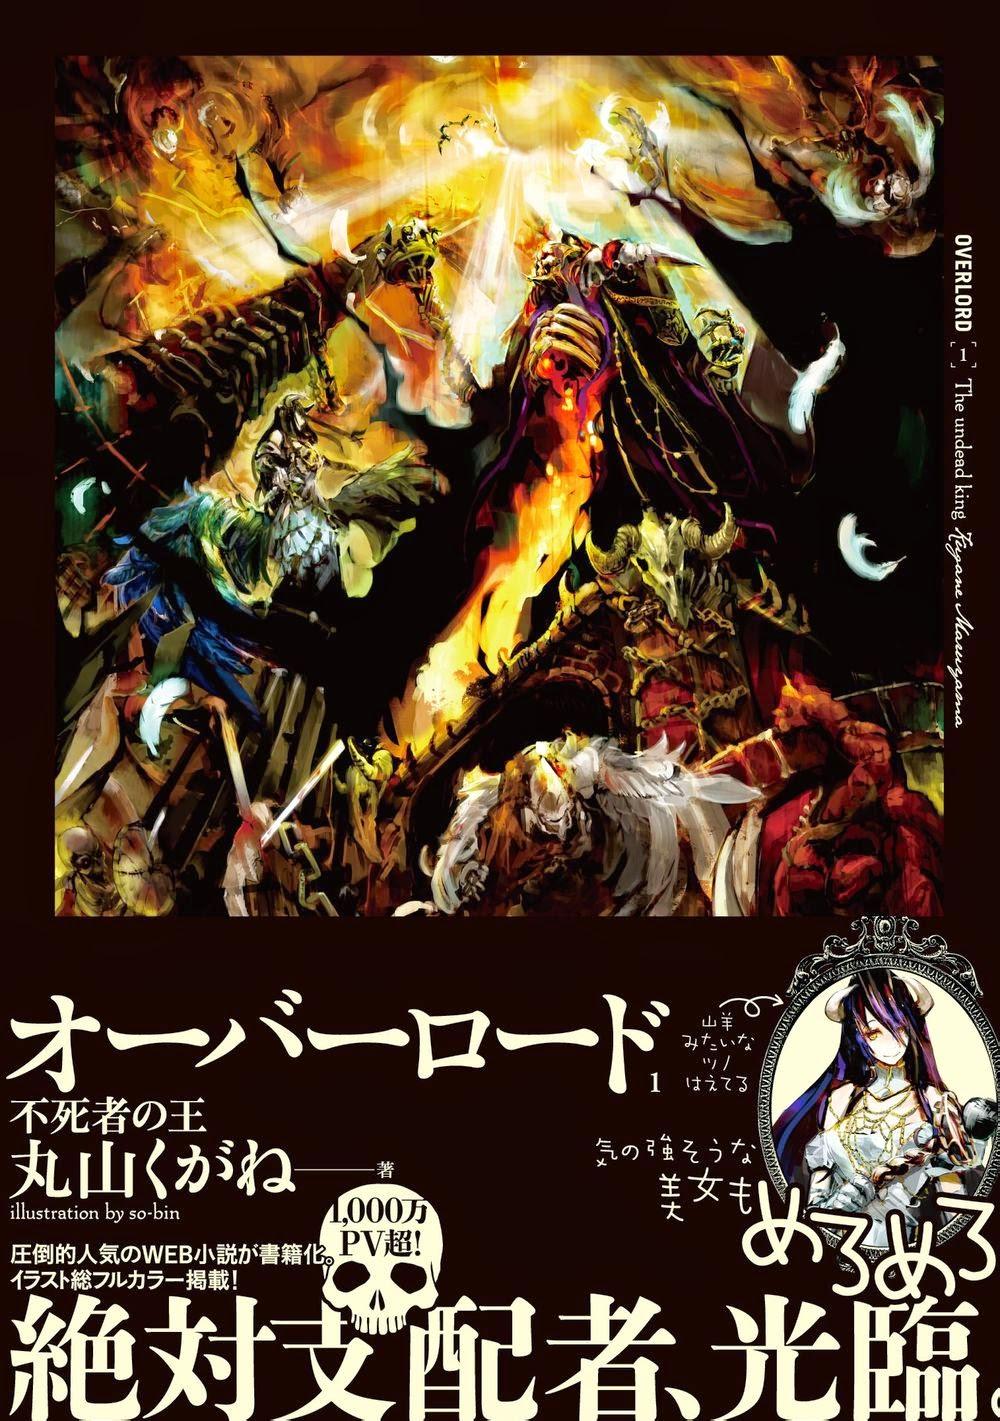 Amazon.com: Overlord, Vol. 12 (light novel): The Paladin